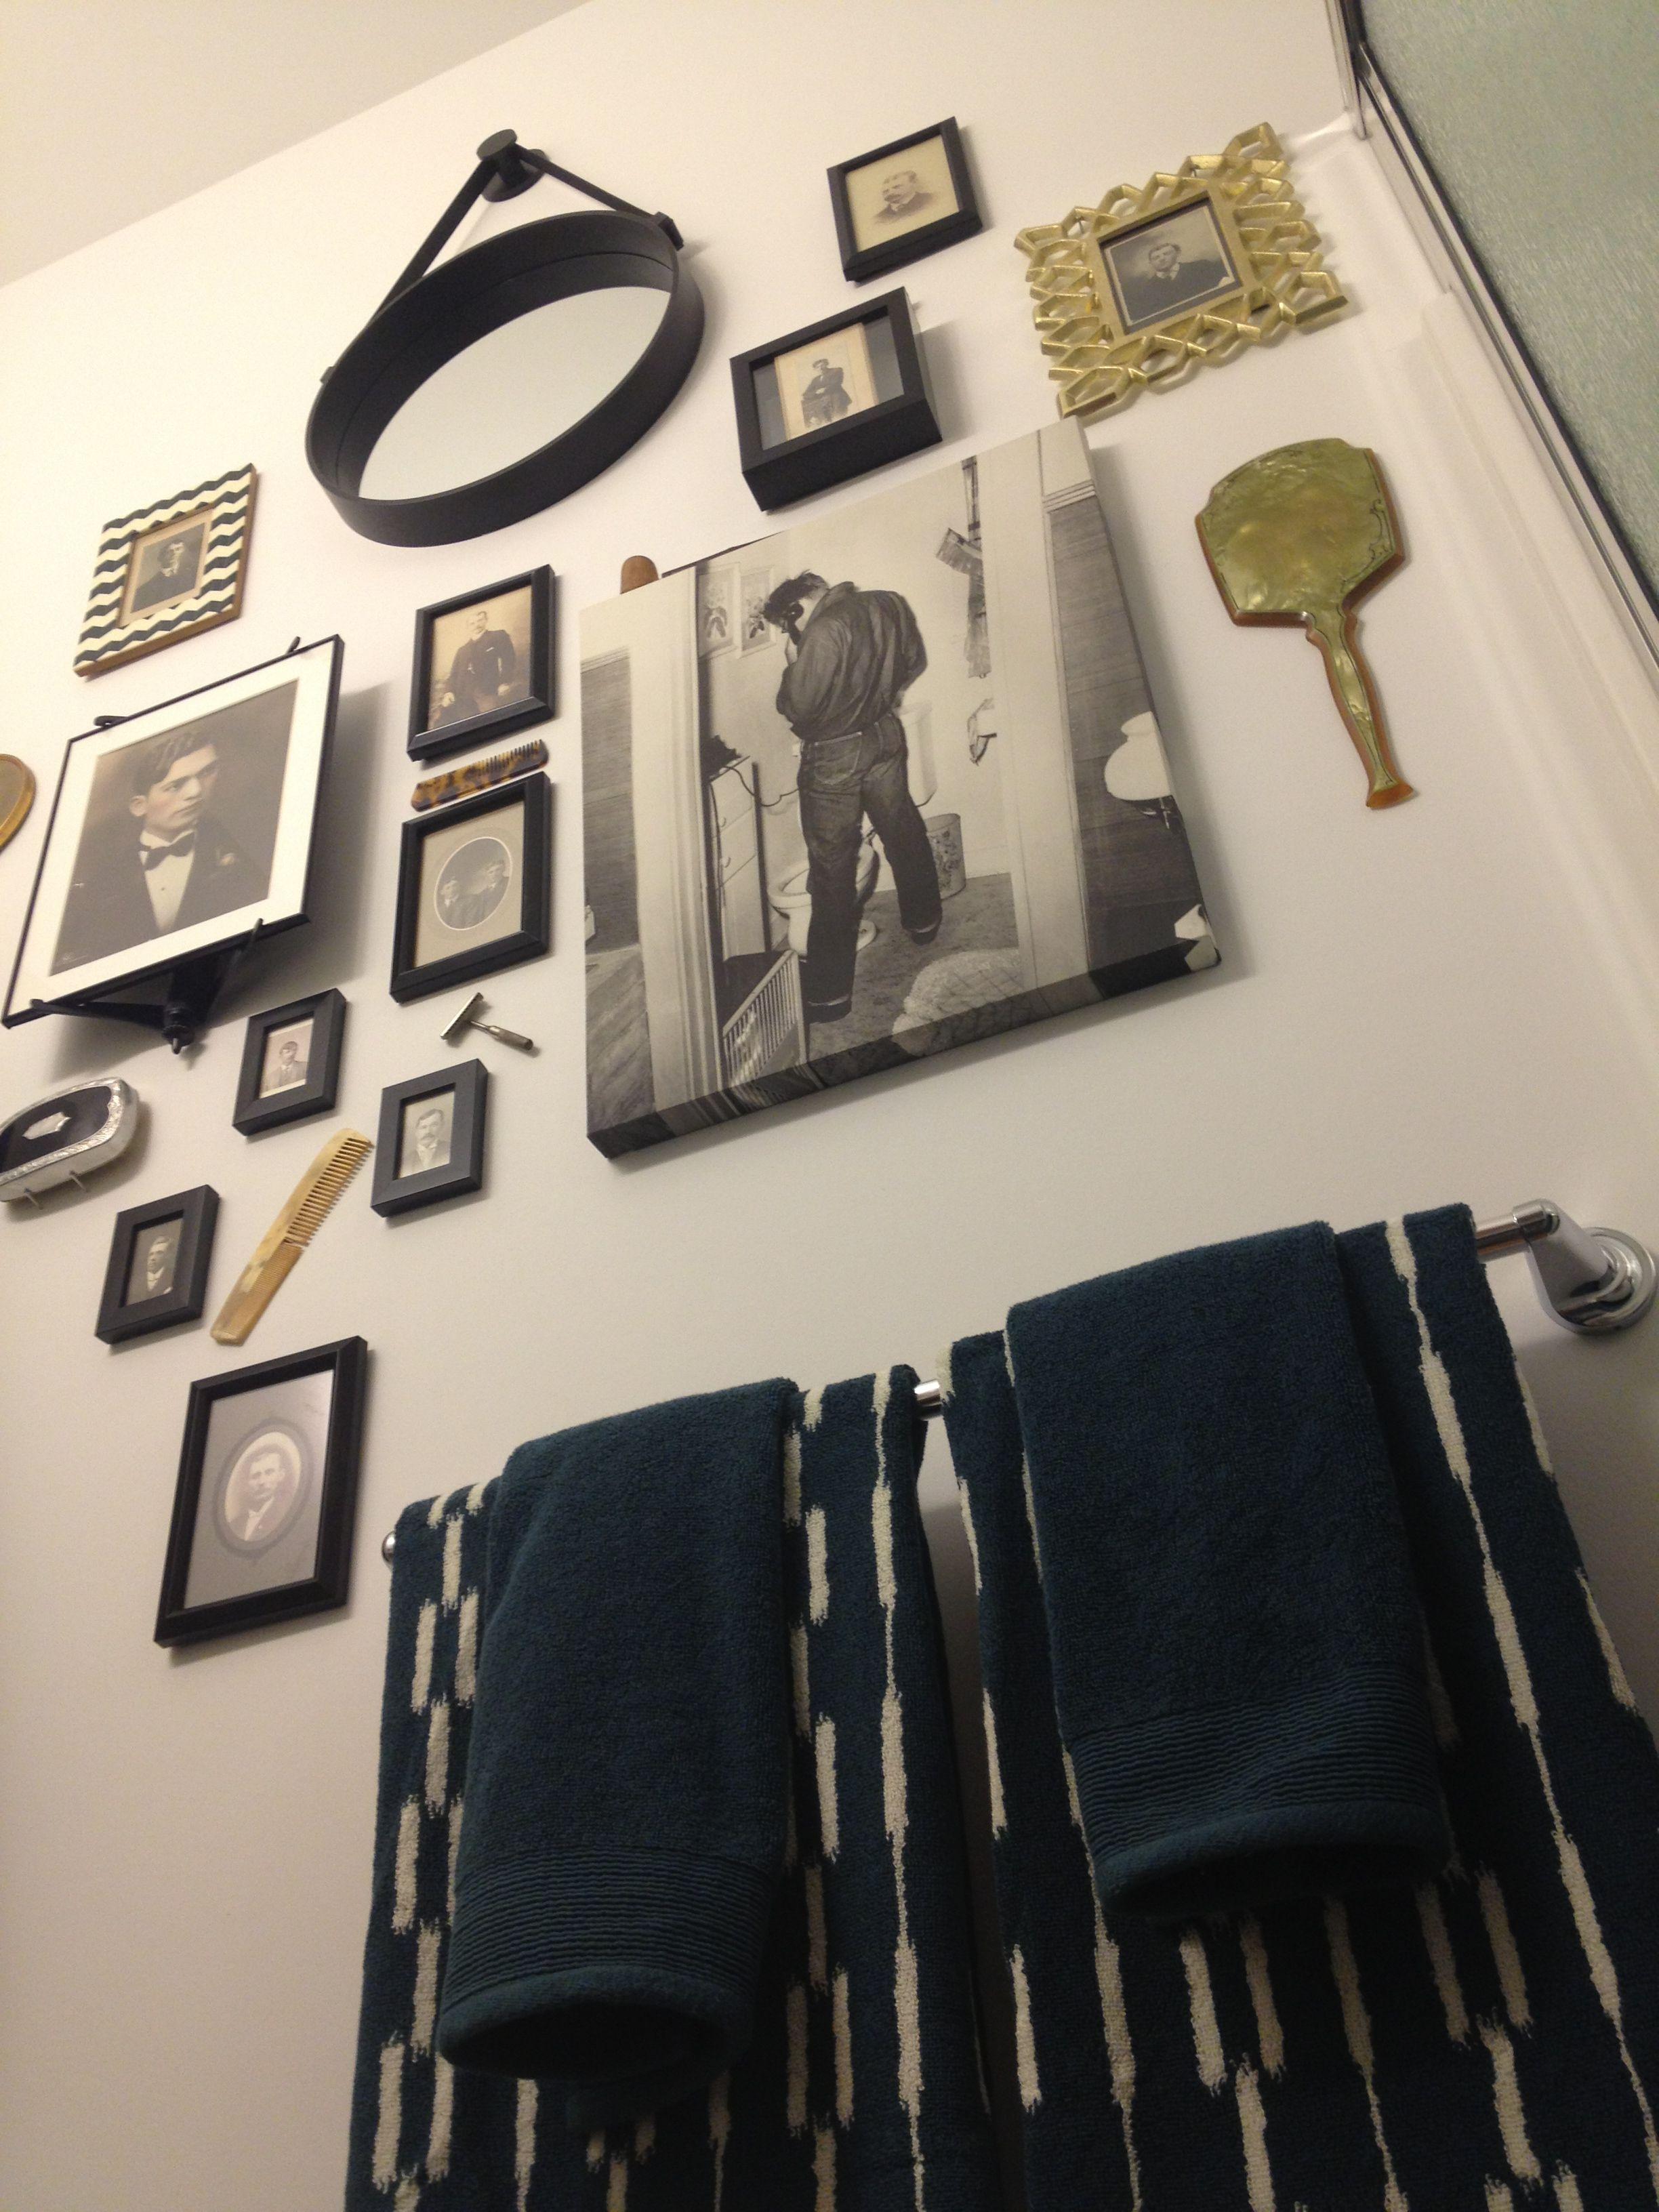 Bathroom Decorating Ideas Men modern, vintage, hipster, mens, grooming, bathroom, decor | home